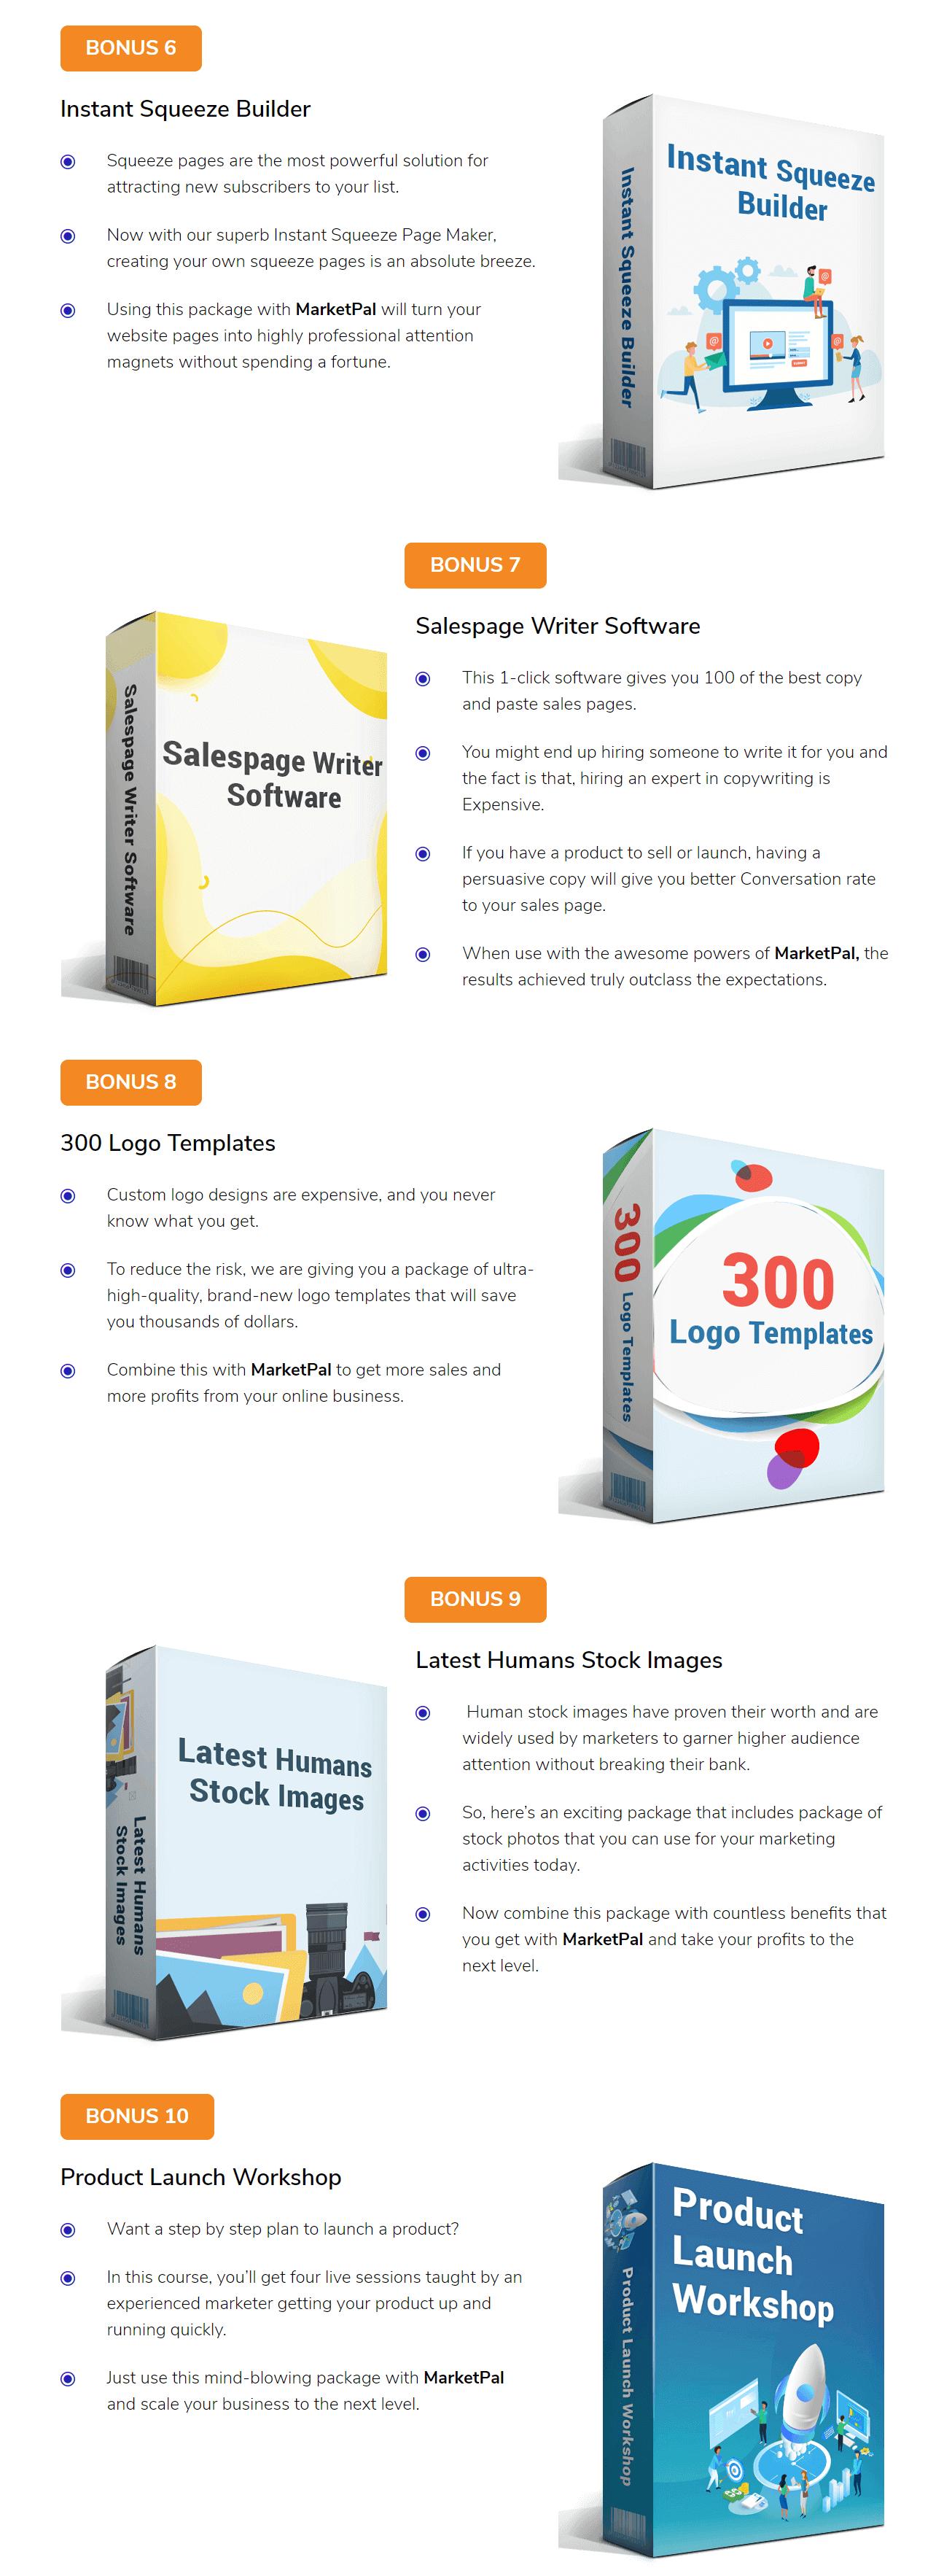 MarketPal-Review-Bonuses-2